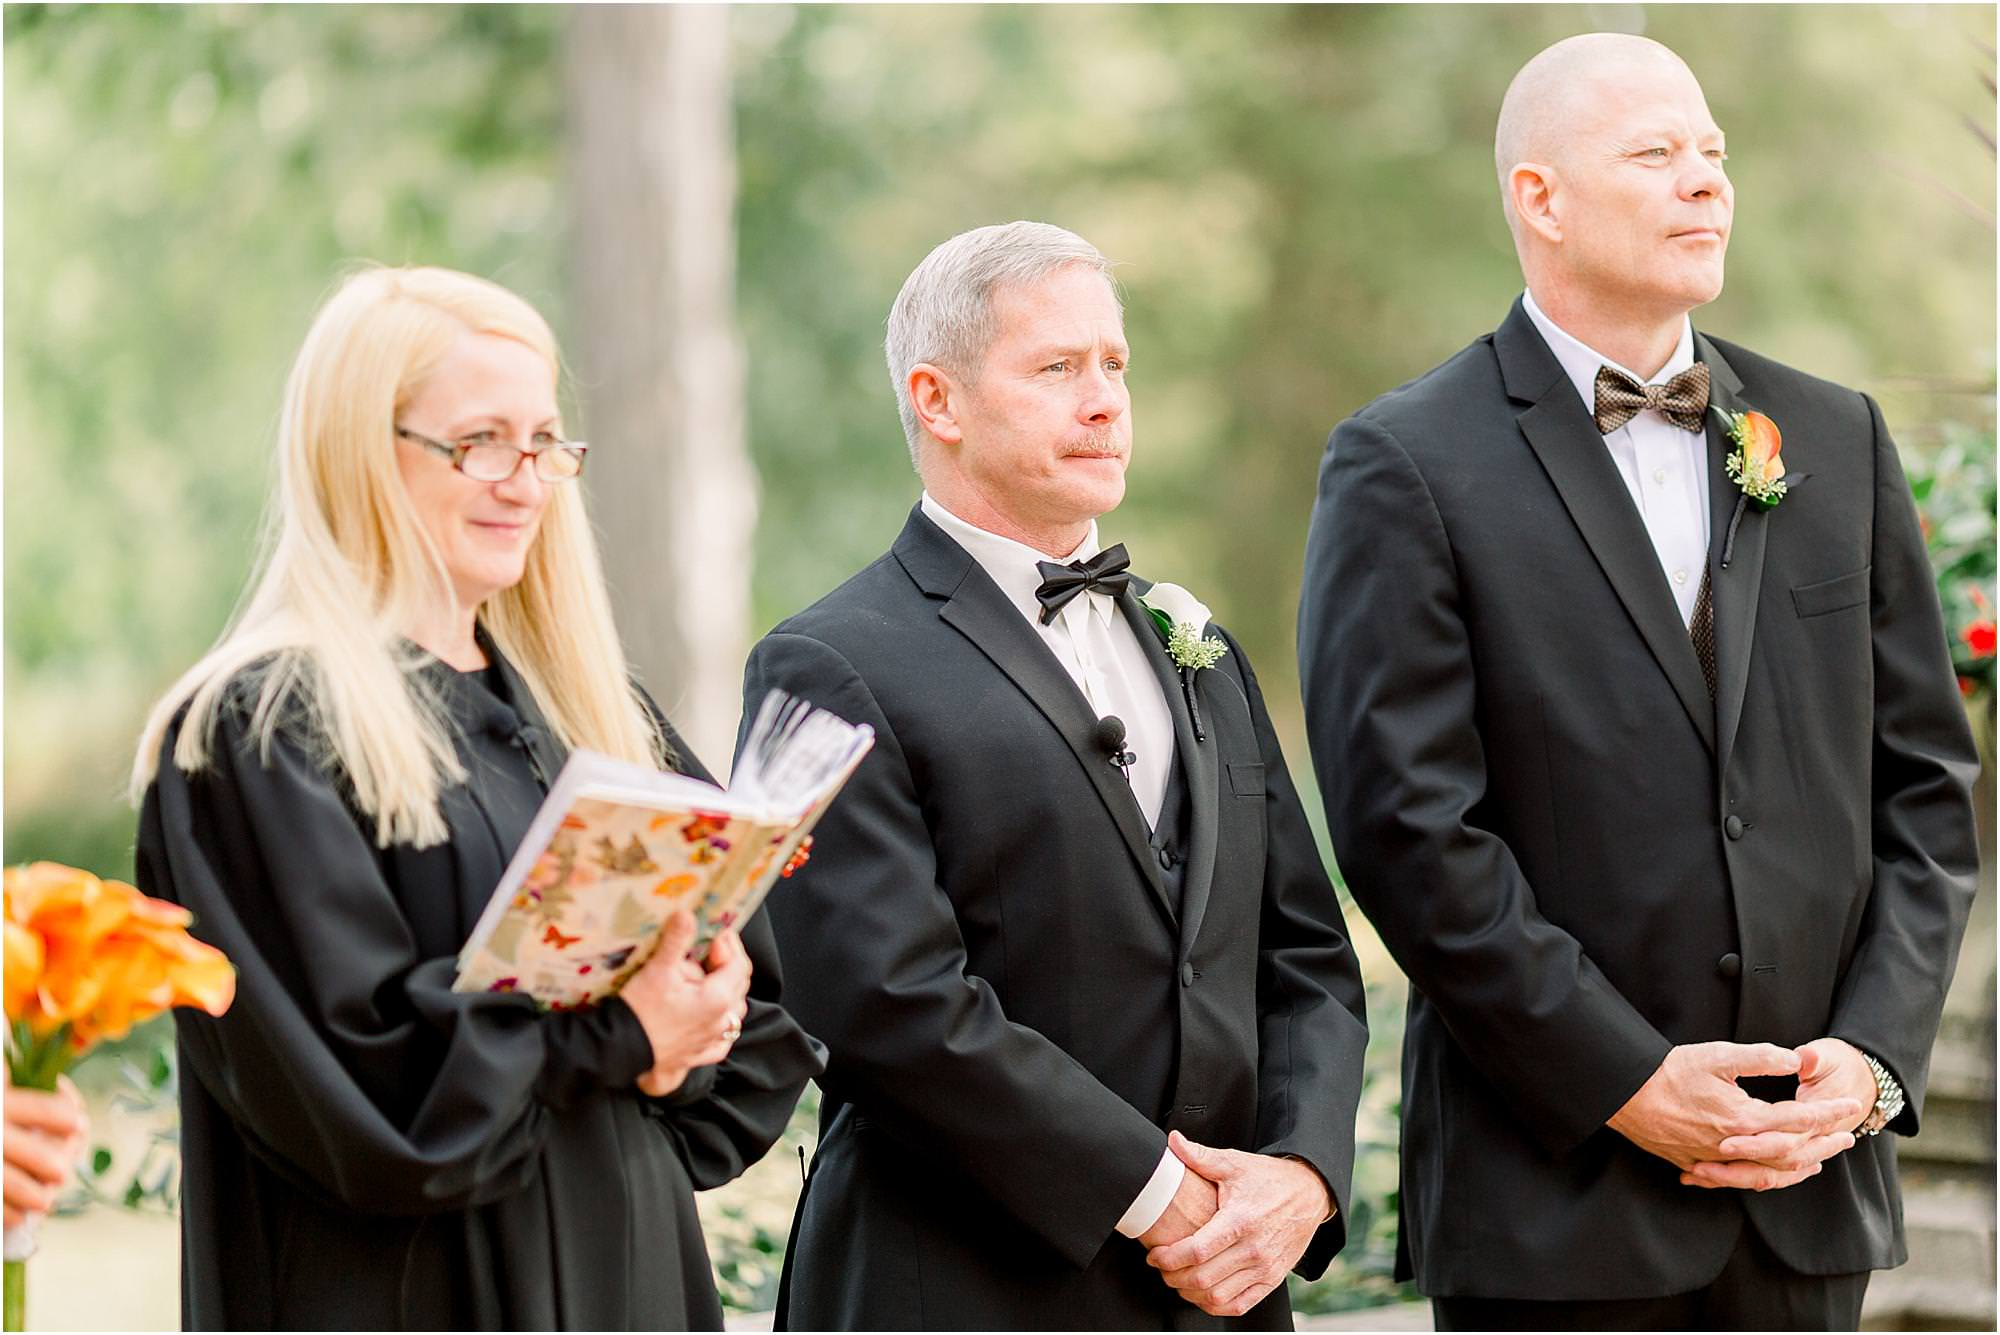 waveny park wedding ceremony